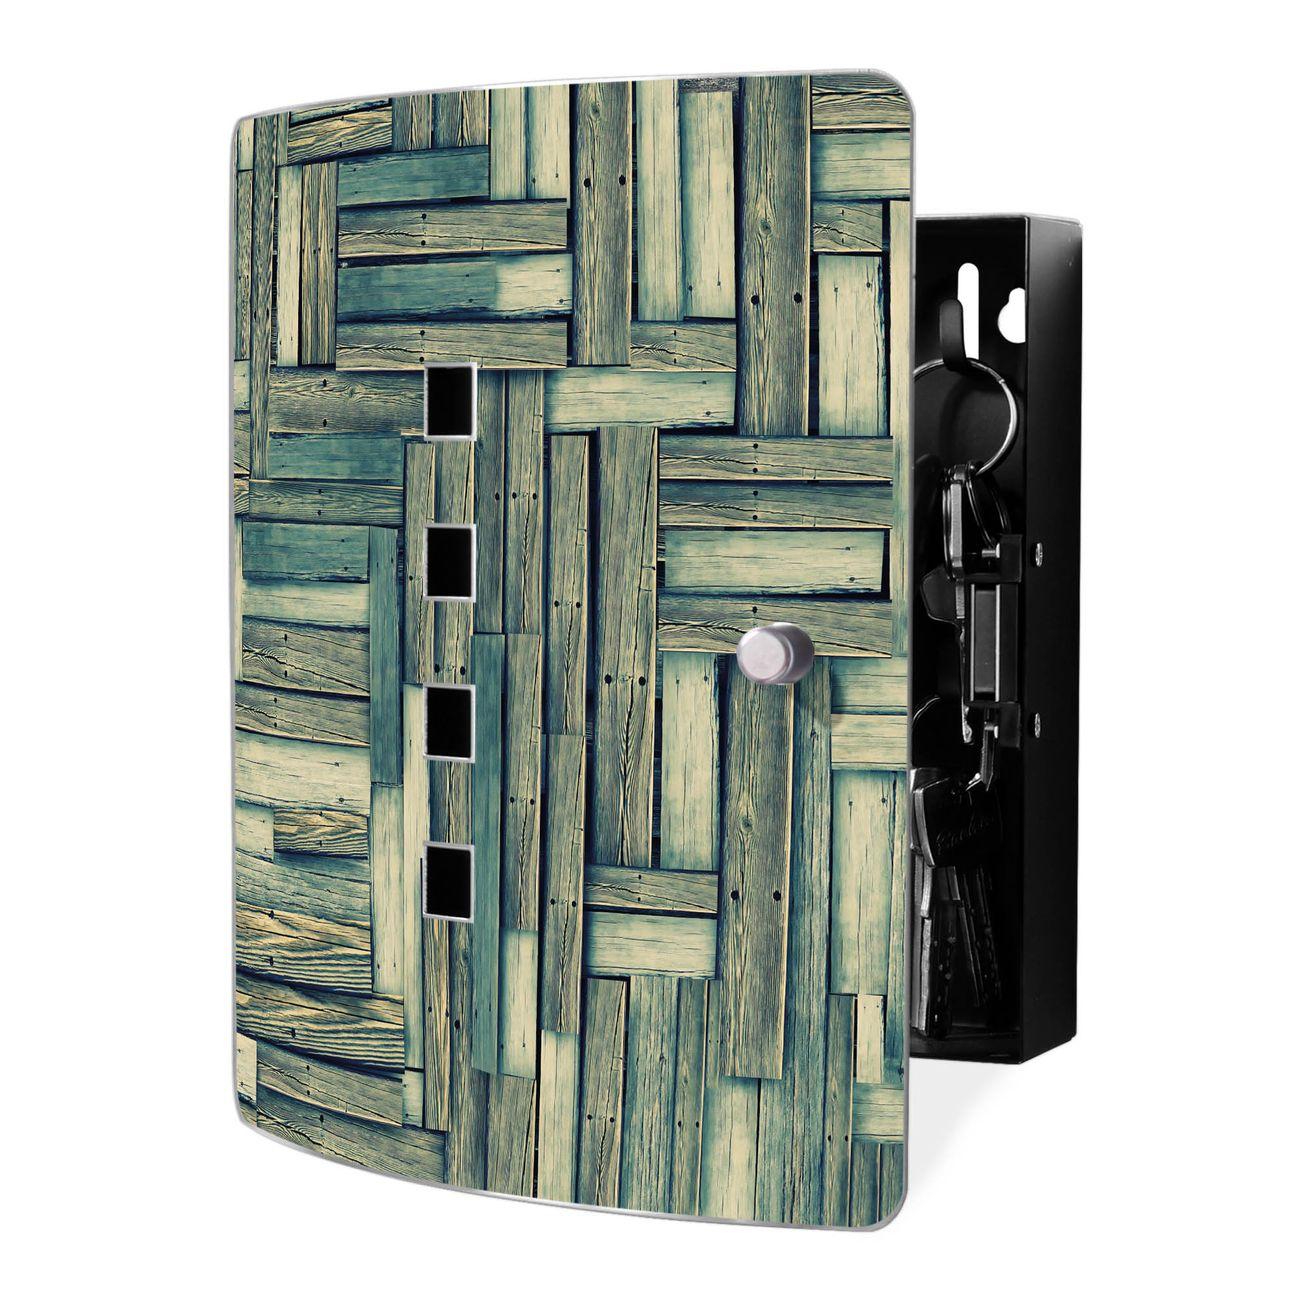 Schlüsselkasten Motiv Grüne Planken